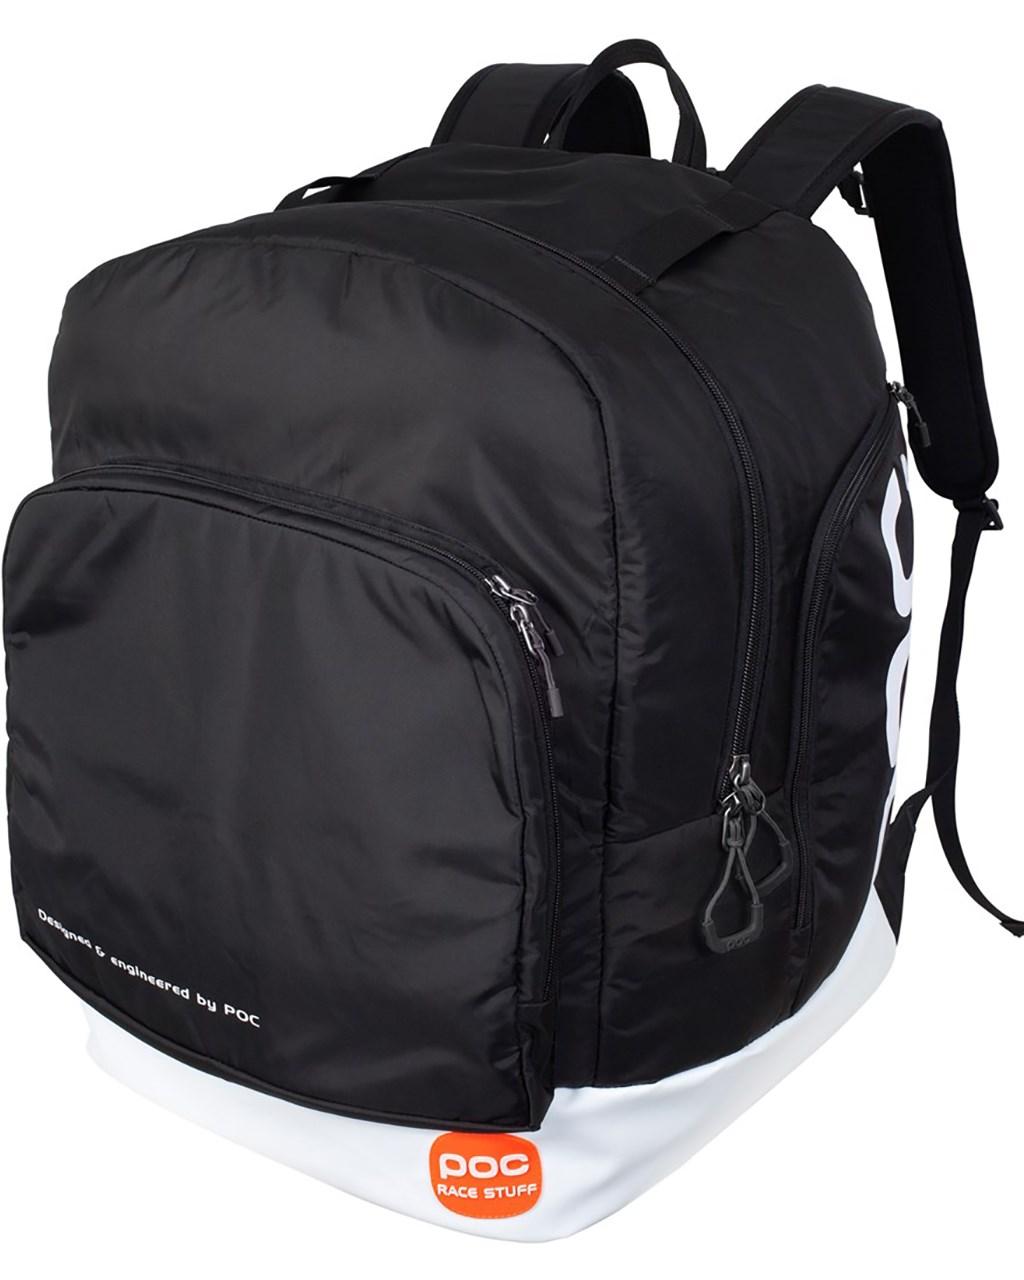 Race Stuff Backpack 60L Uranium Black 493d07323fdca